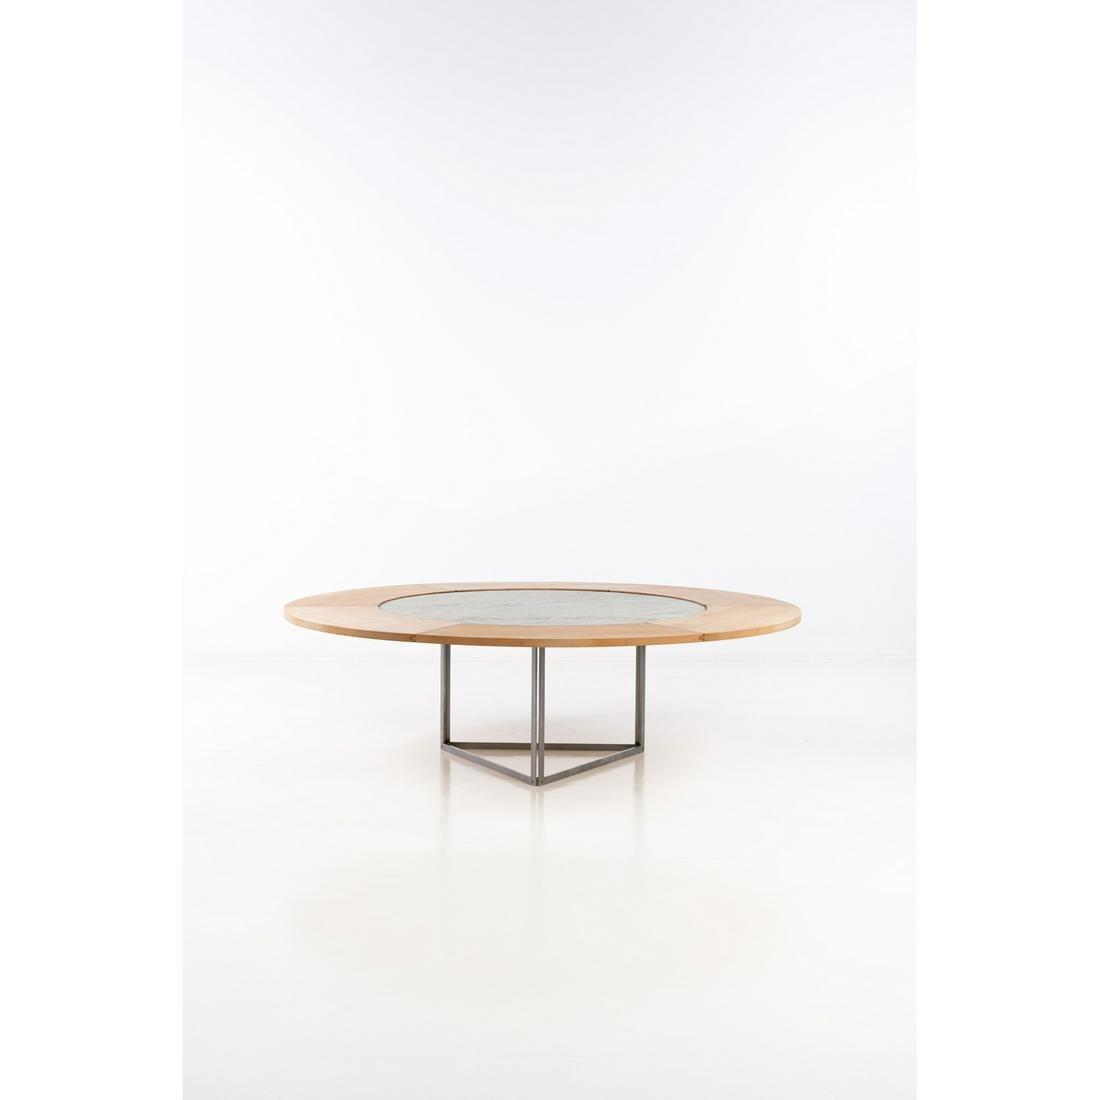 Poul Kjaerholm (1929-1980) Models no. PK 56 (Table) and